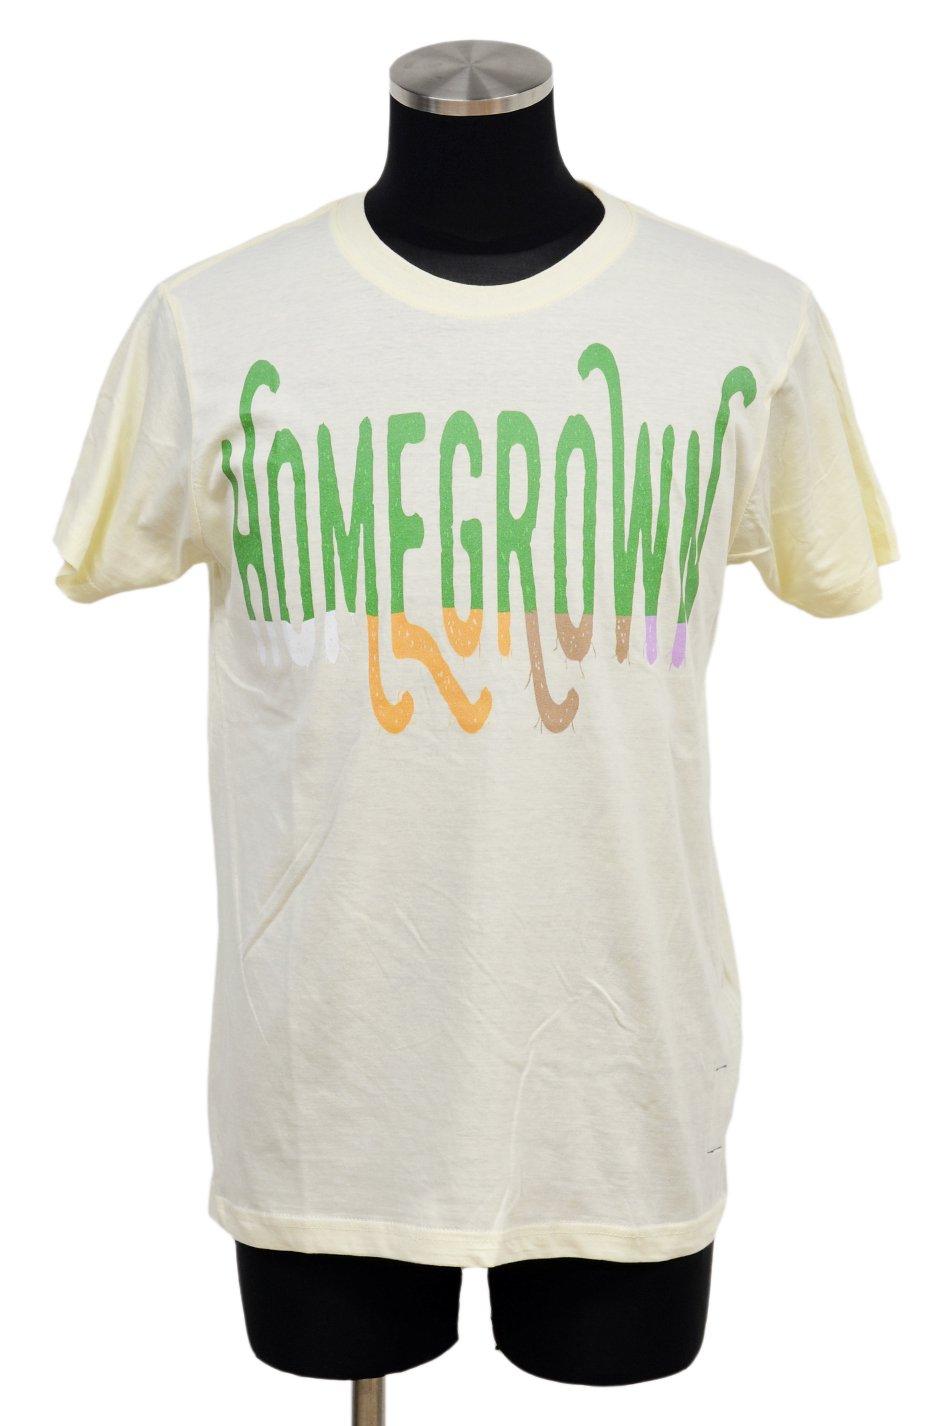 40%off! ARIGATO FAKKYU - アリガトファッキュ HOMEGROWN T-Shirt / Natural